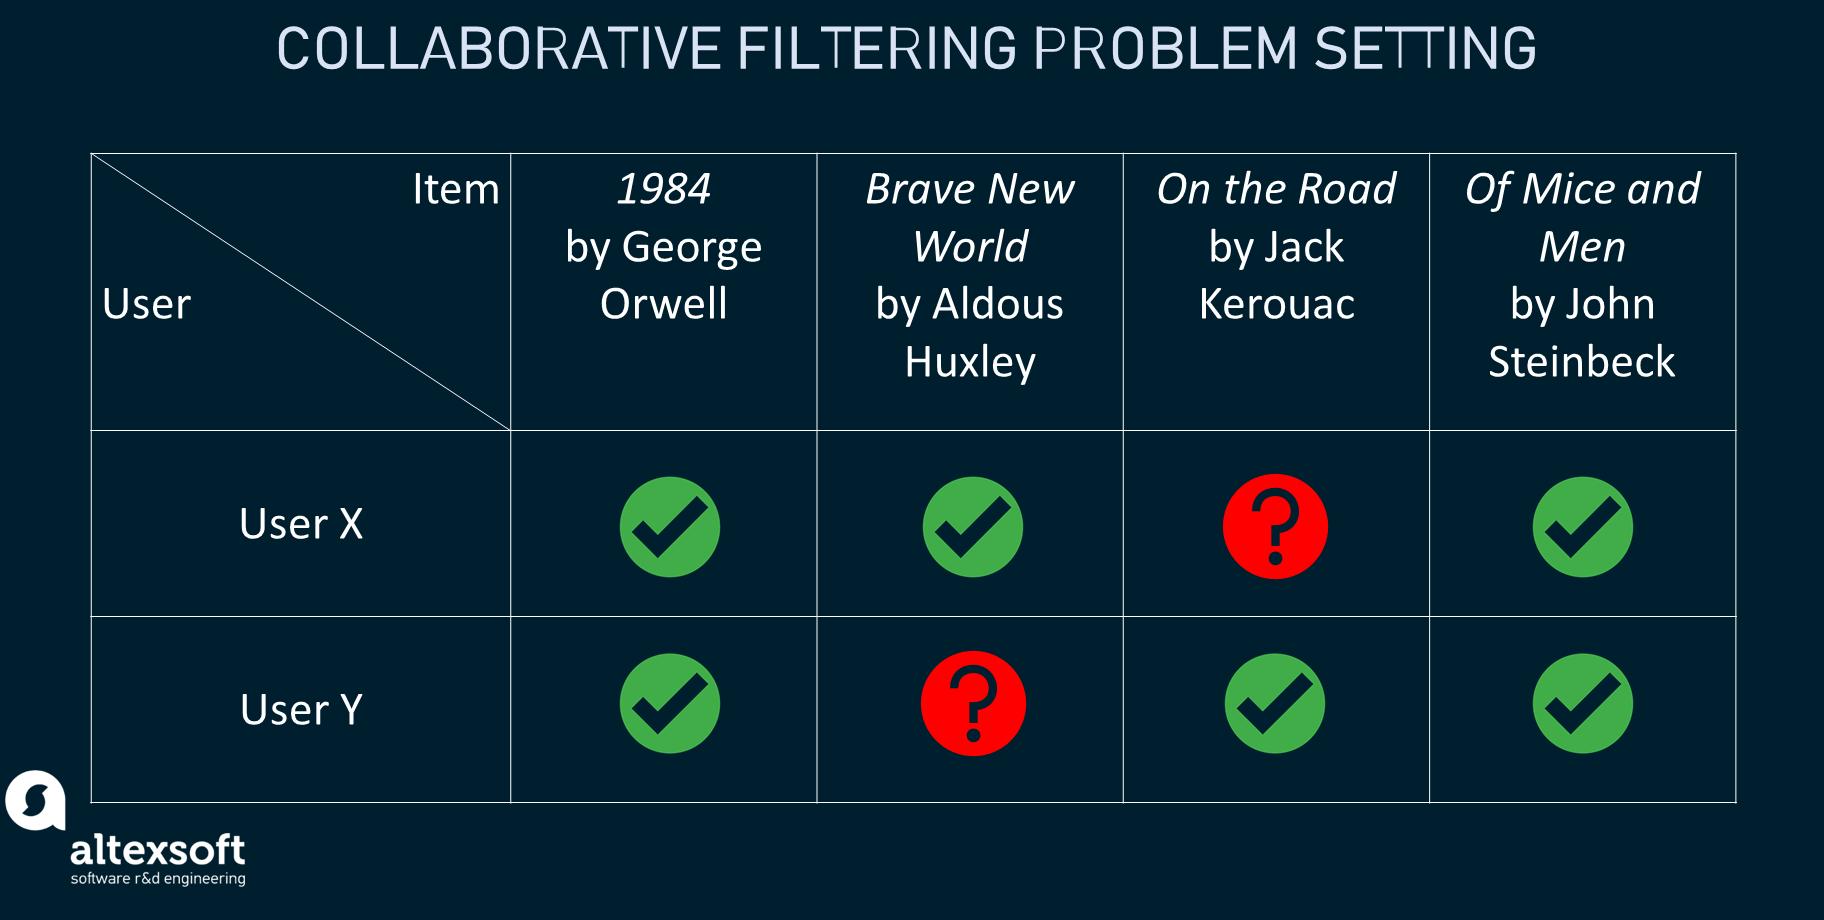 How collaborative filtering sets a problem